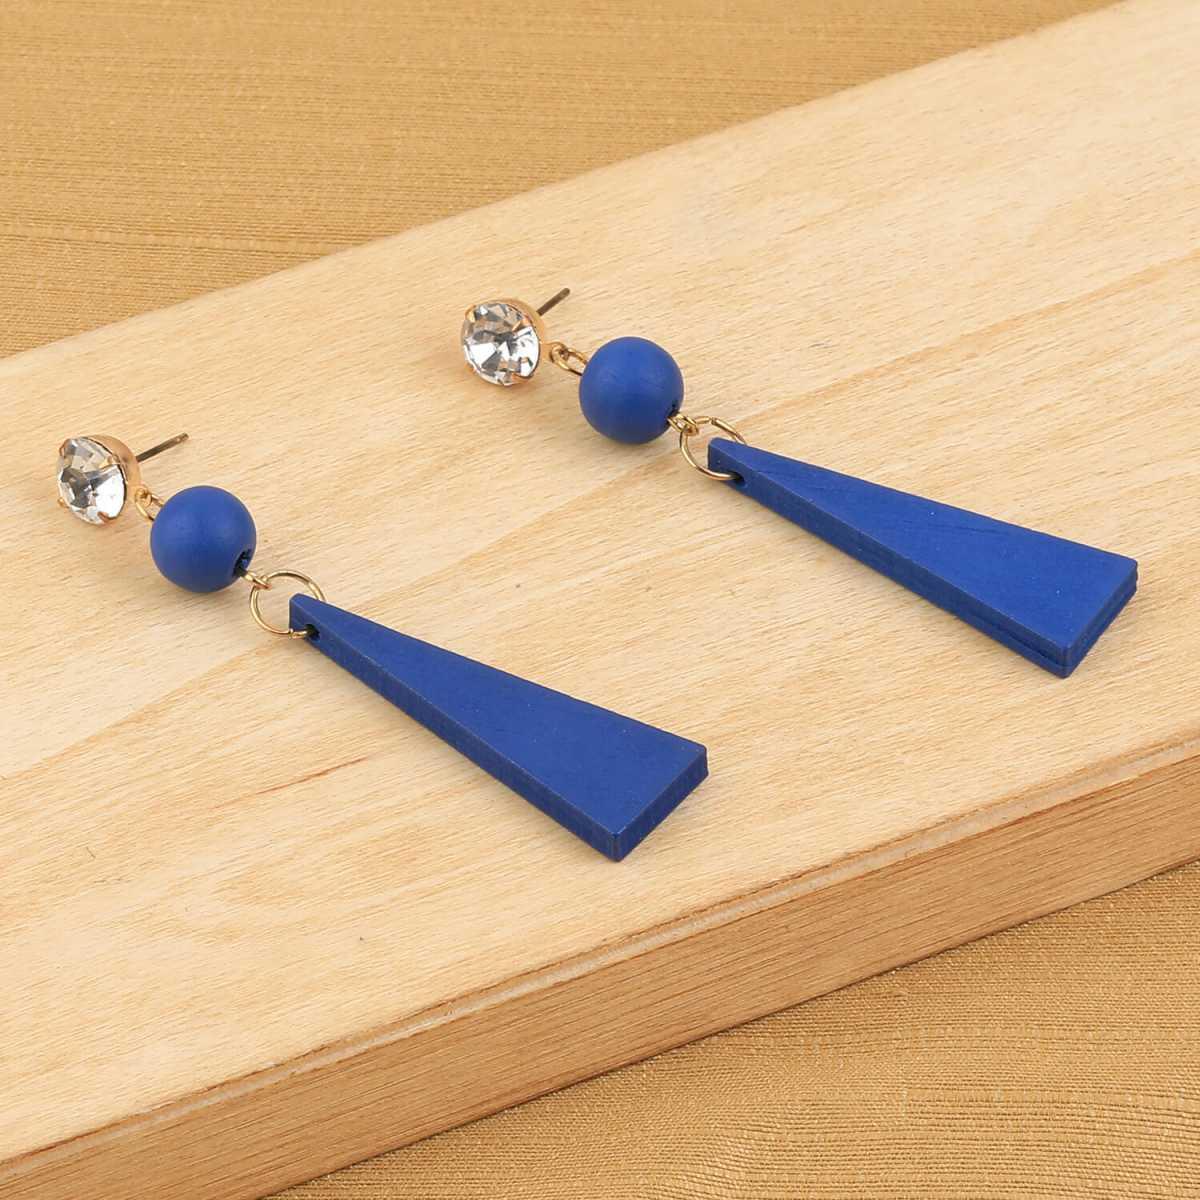 SILVER SHINE Exclusive Diamond Blue Wooden Earrings Long Dangler Light Weight for Girls and Women.